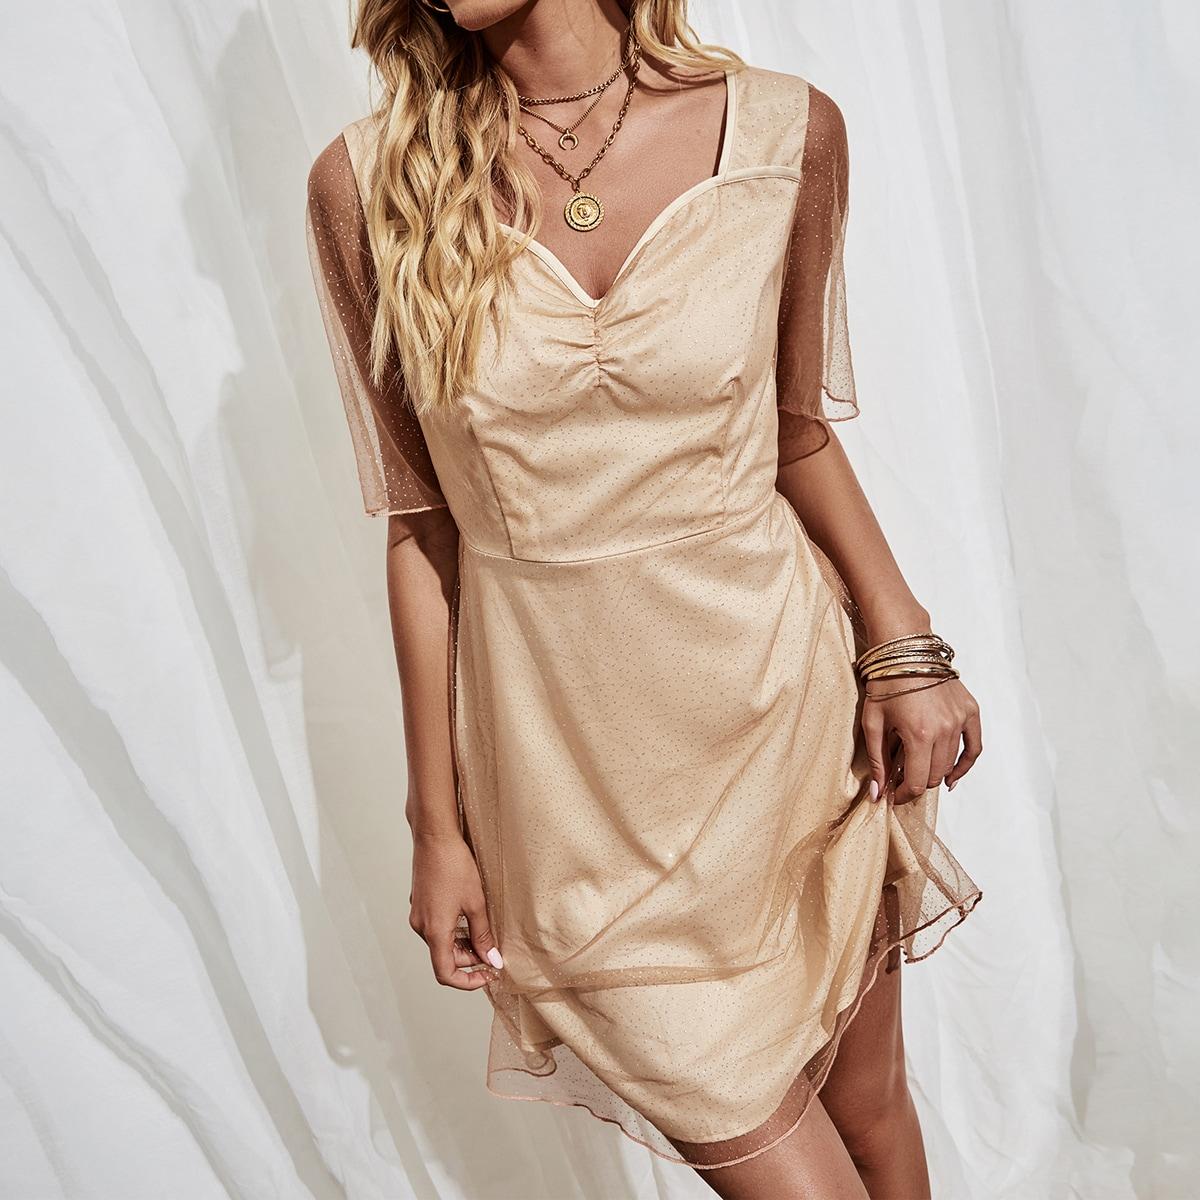 Сетчатое платье с глубоким декольте SheIn swdress23210225496